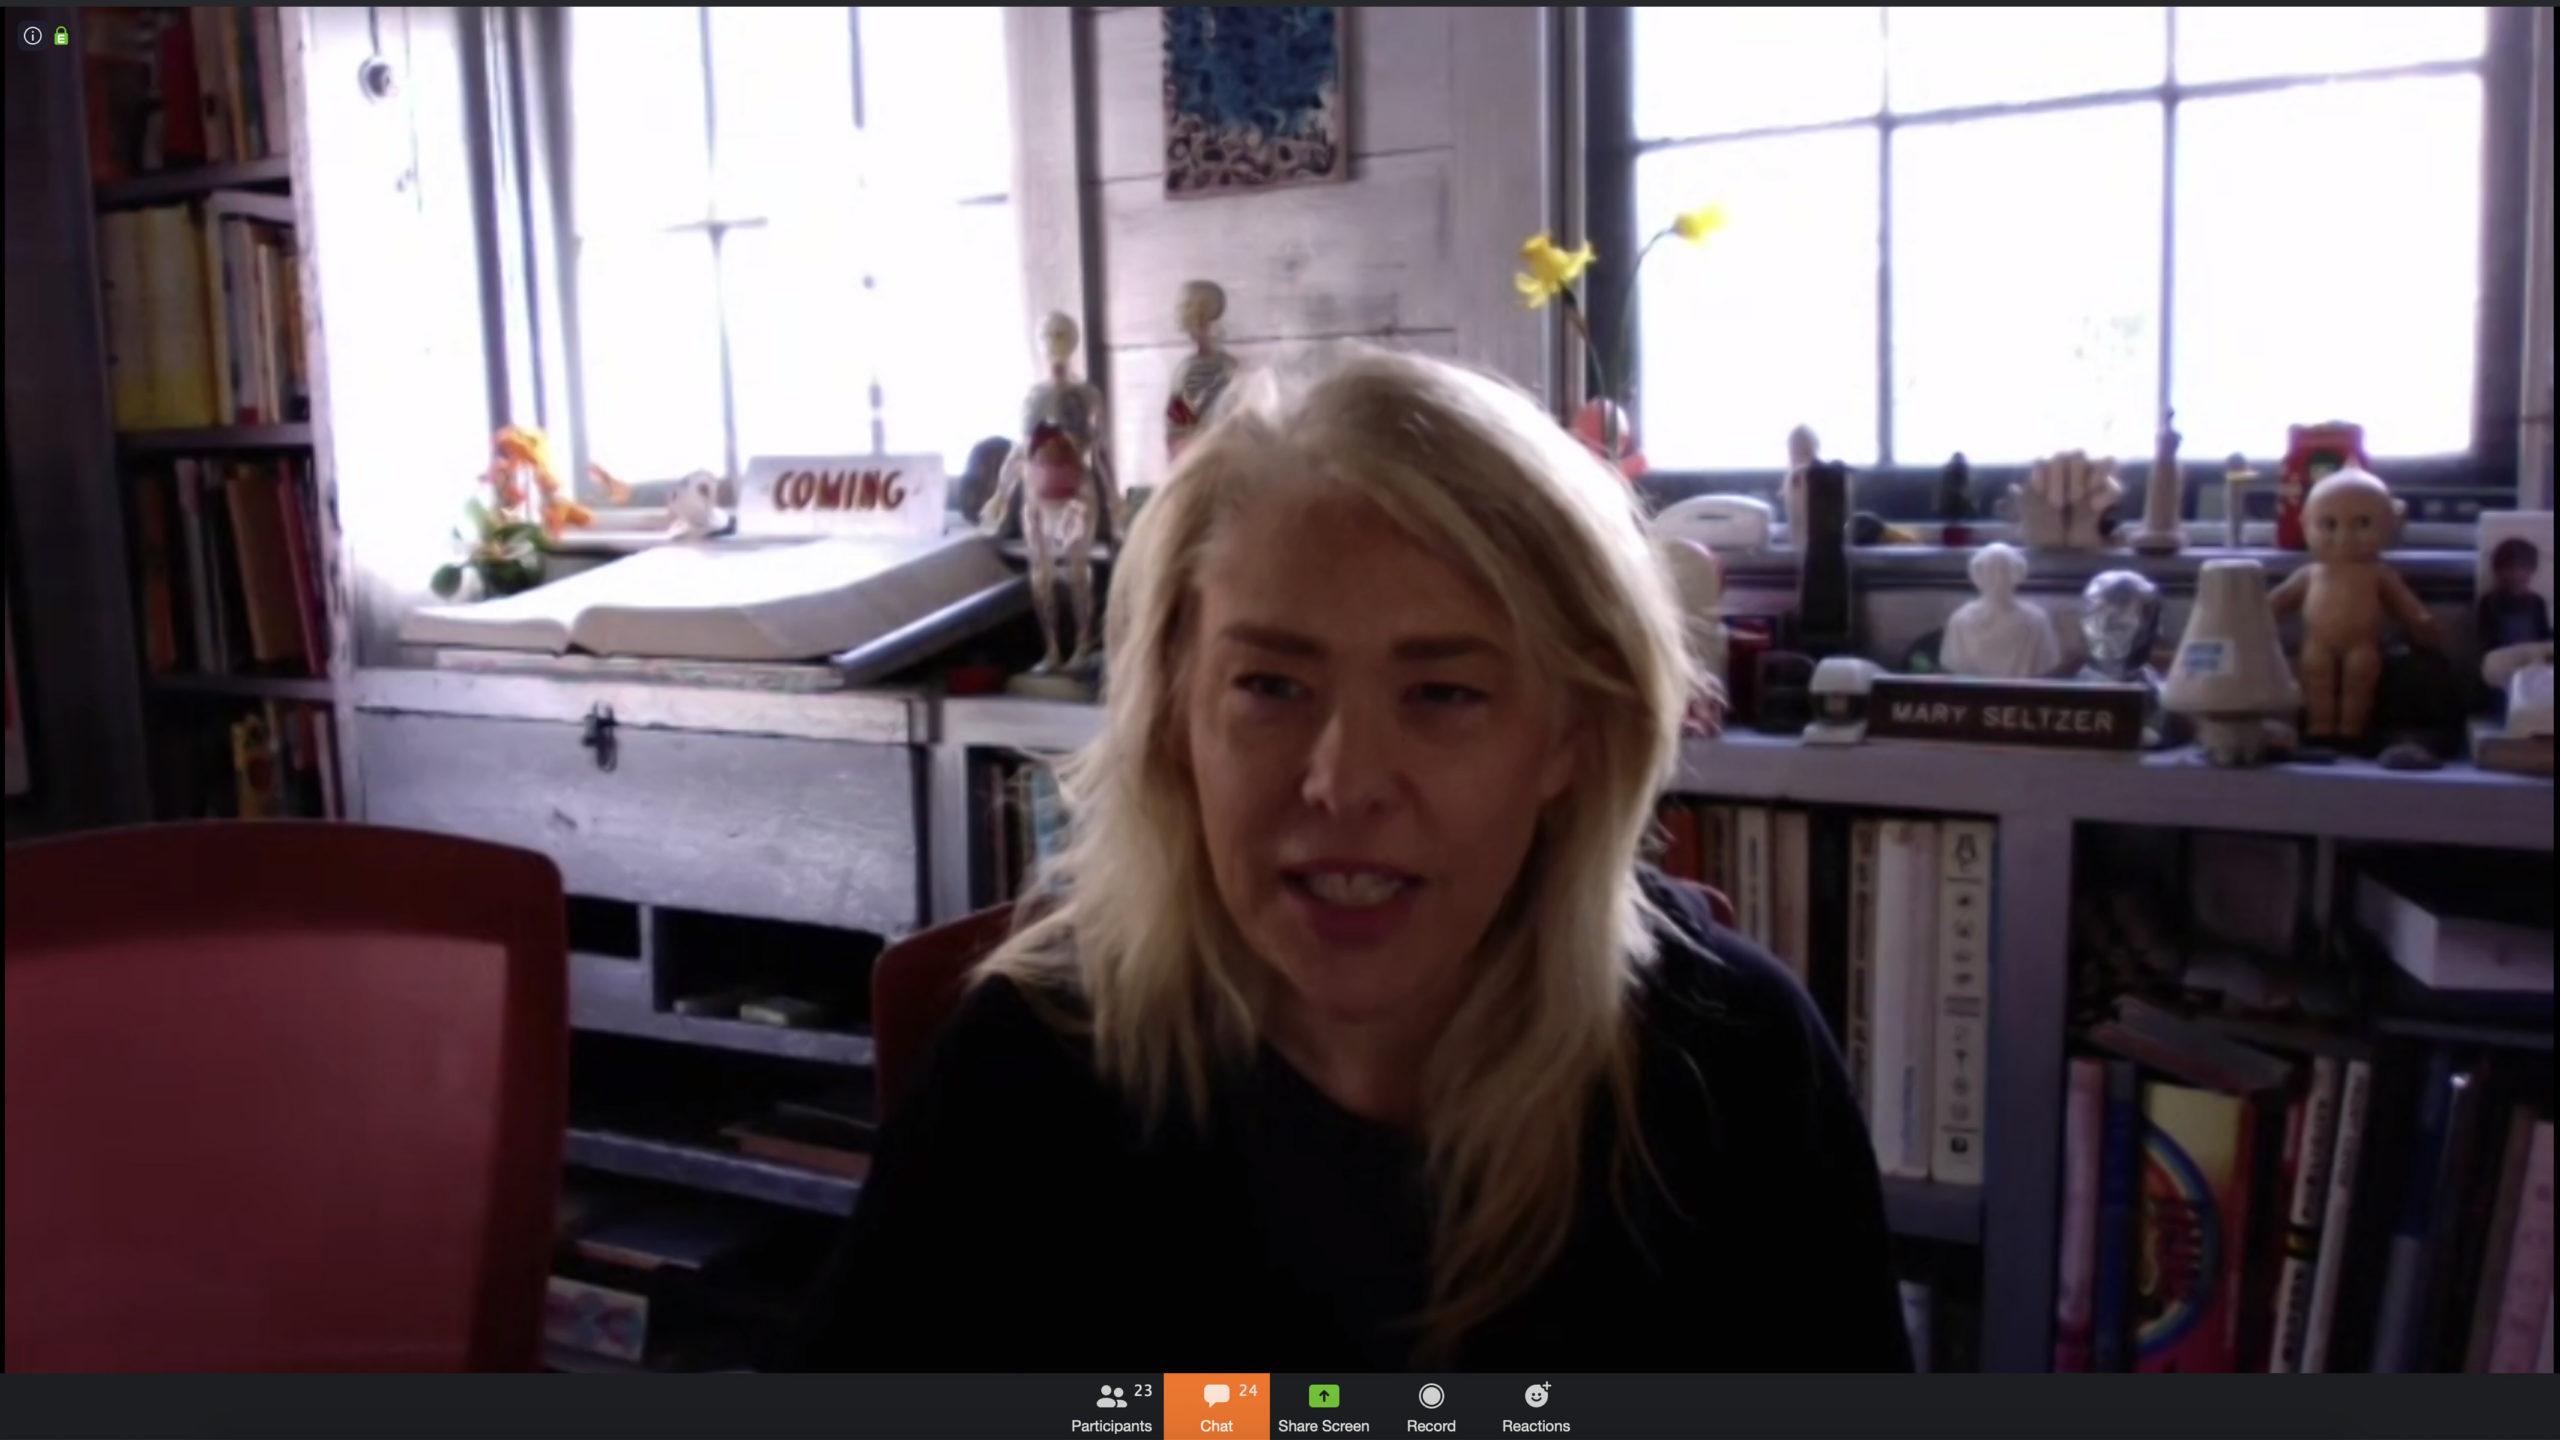 Bonnie Siegler live on zoom